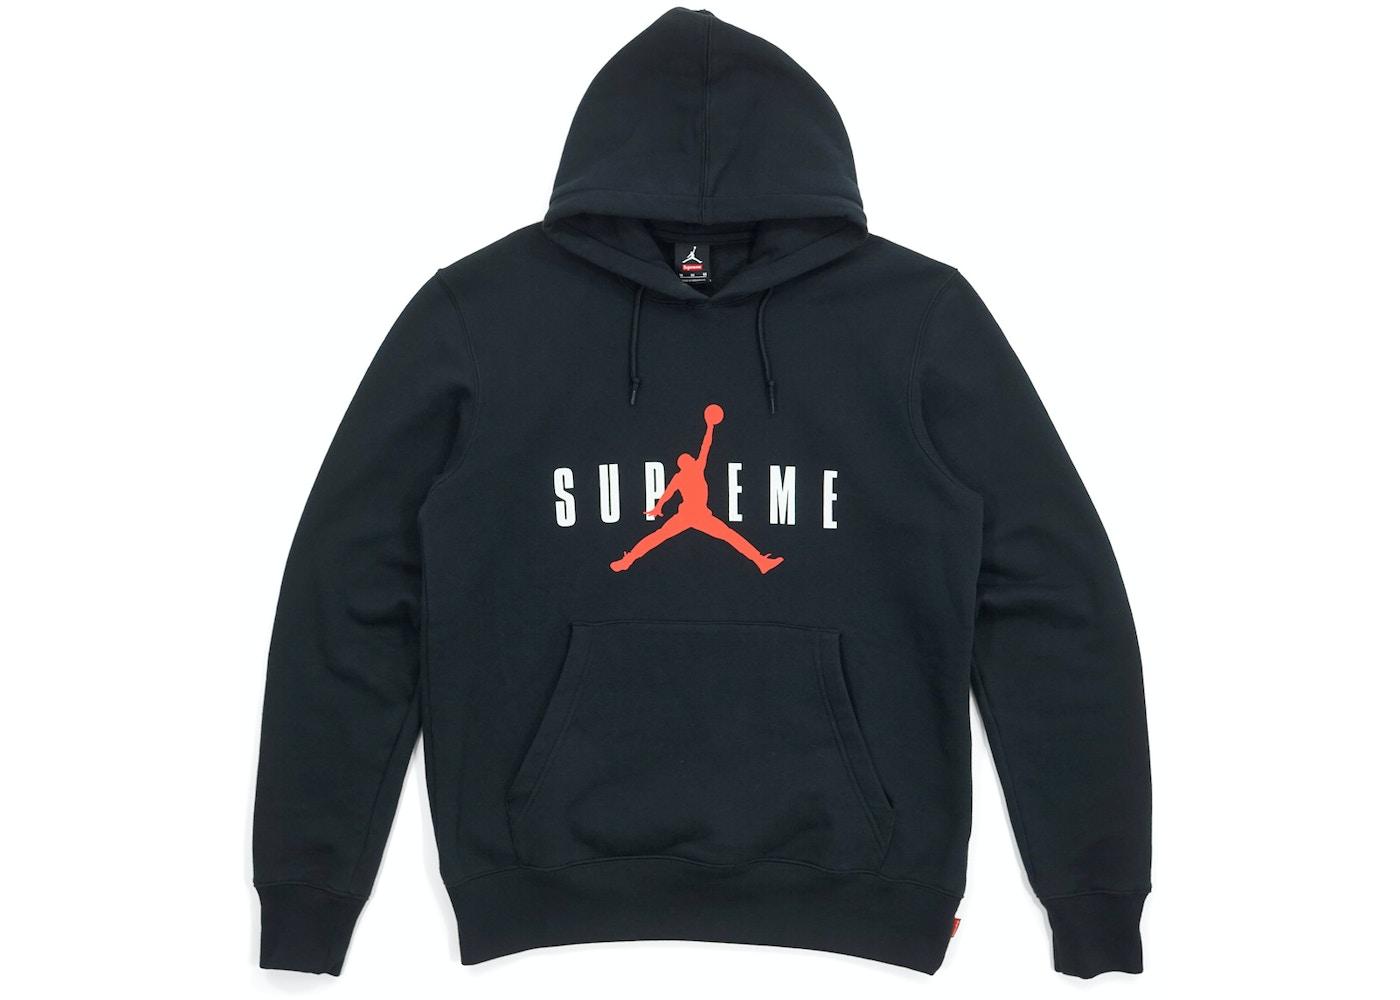 moda najlepszy niesamowita cena Supreme Jordan Hooded Pullover Black